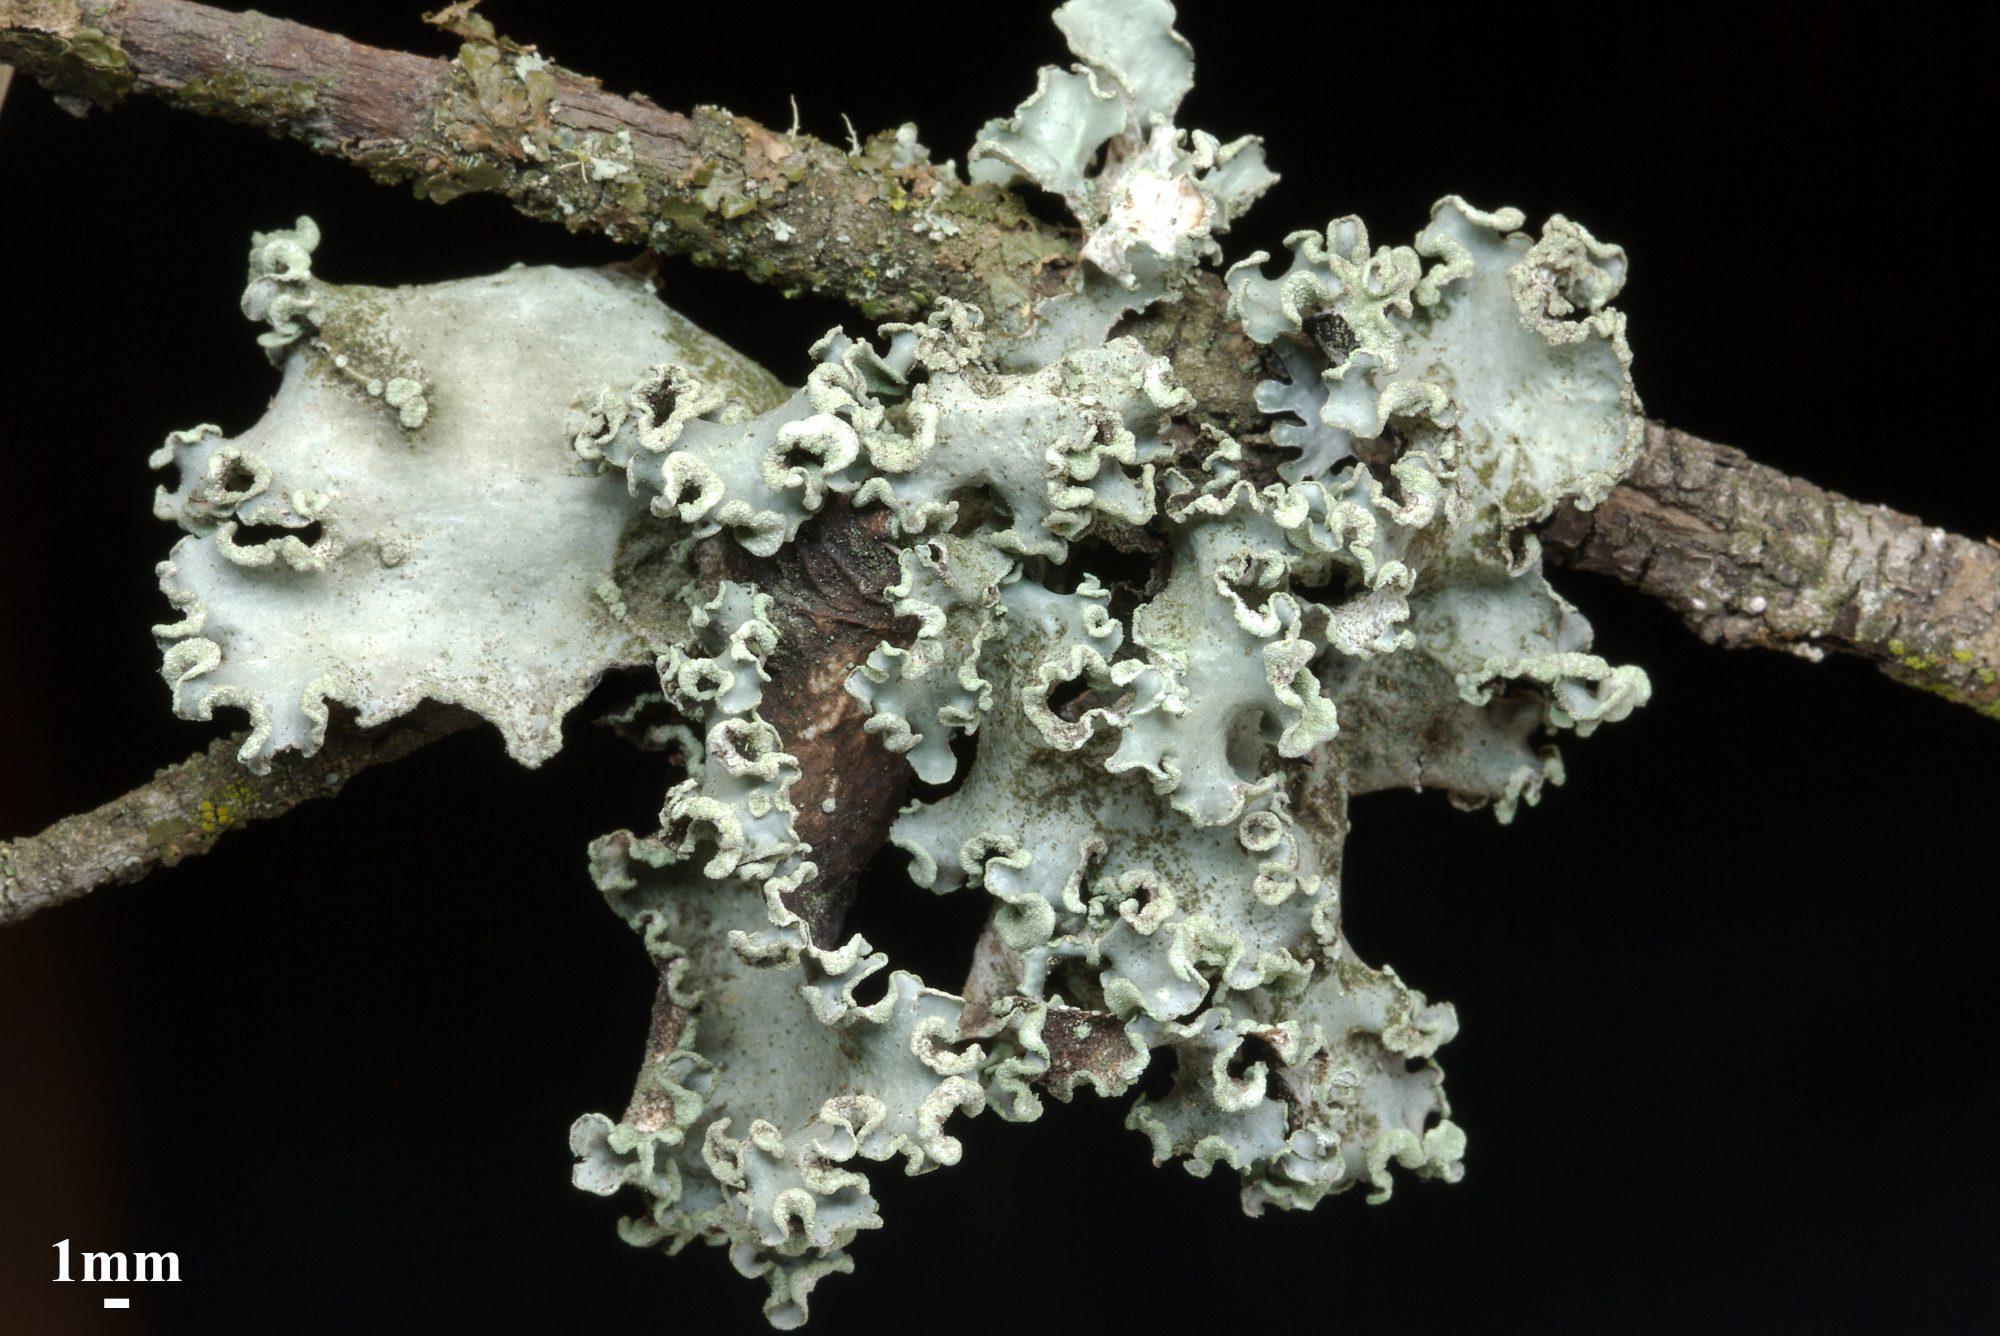 Image: ruffled edge green lichen on a twig